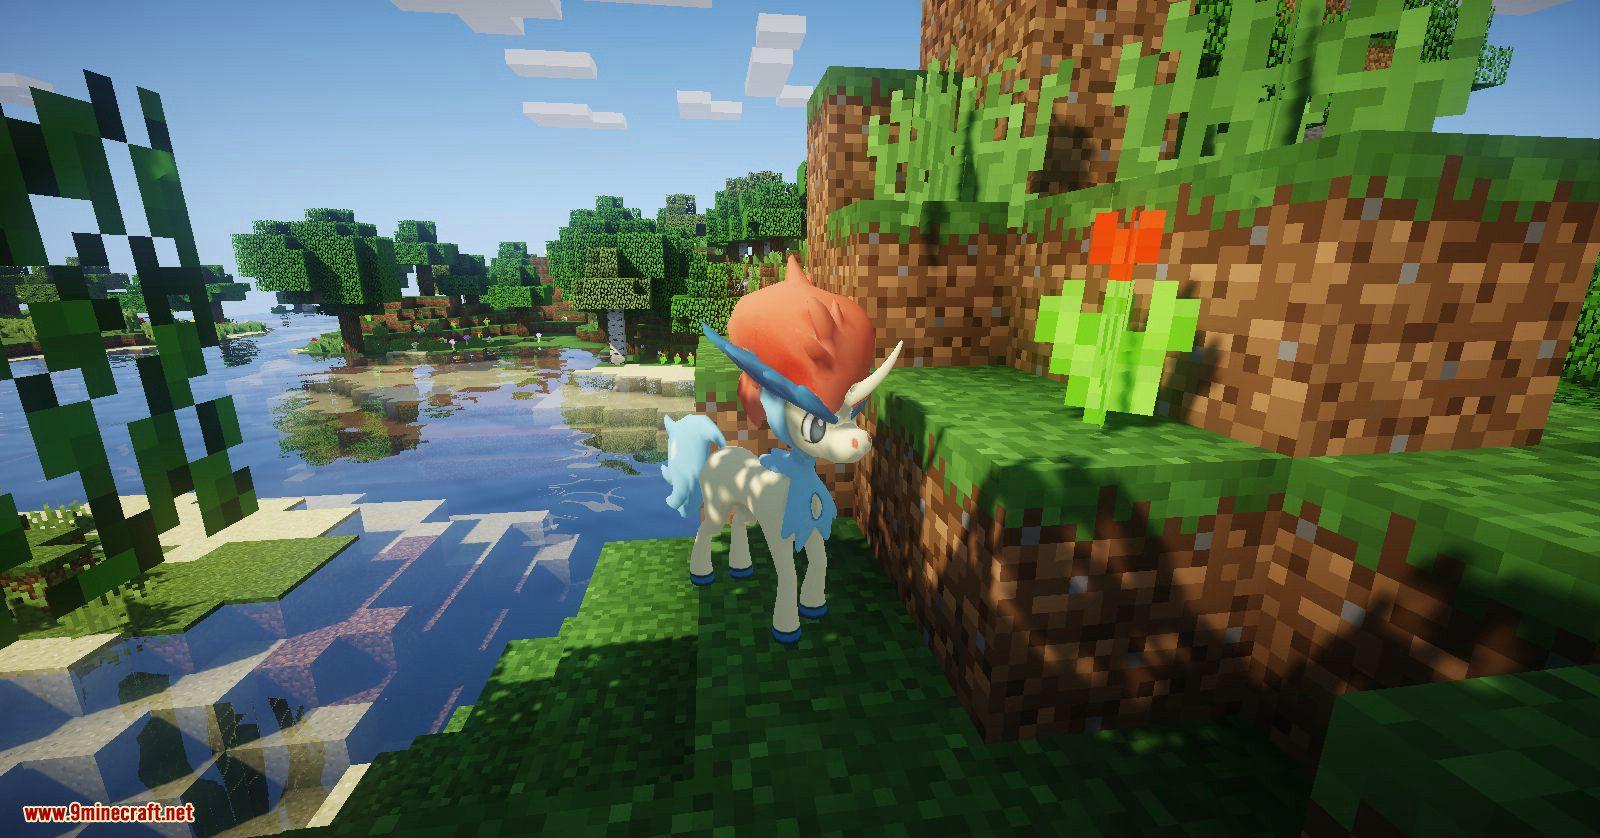 Gameshark mod for Minecraft (5)